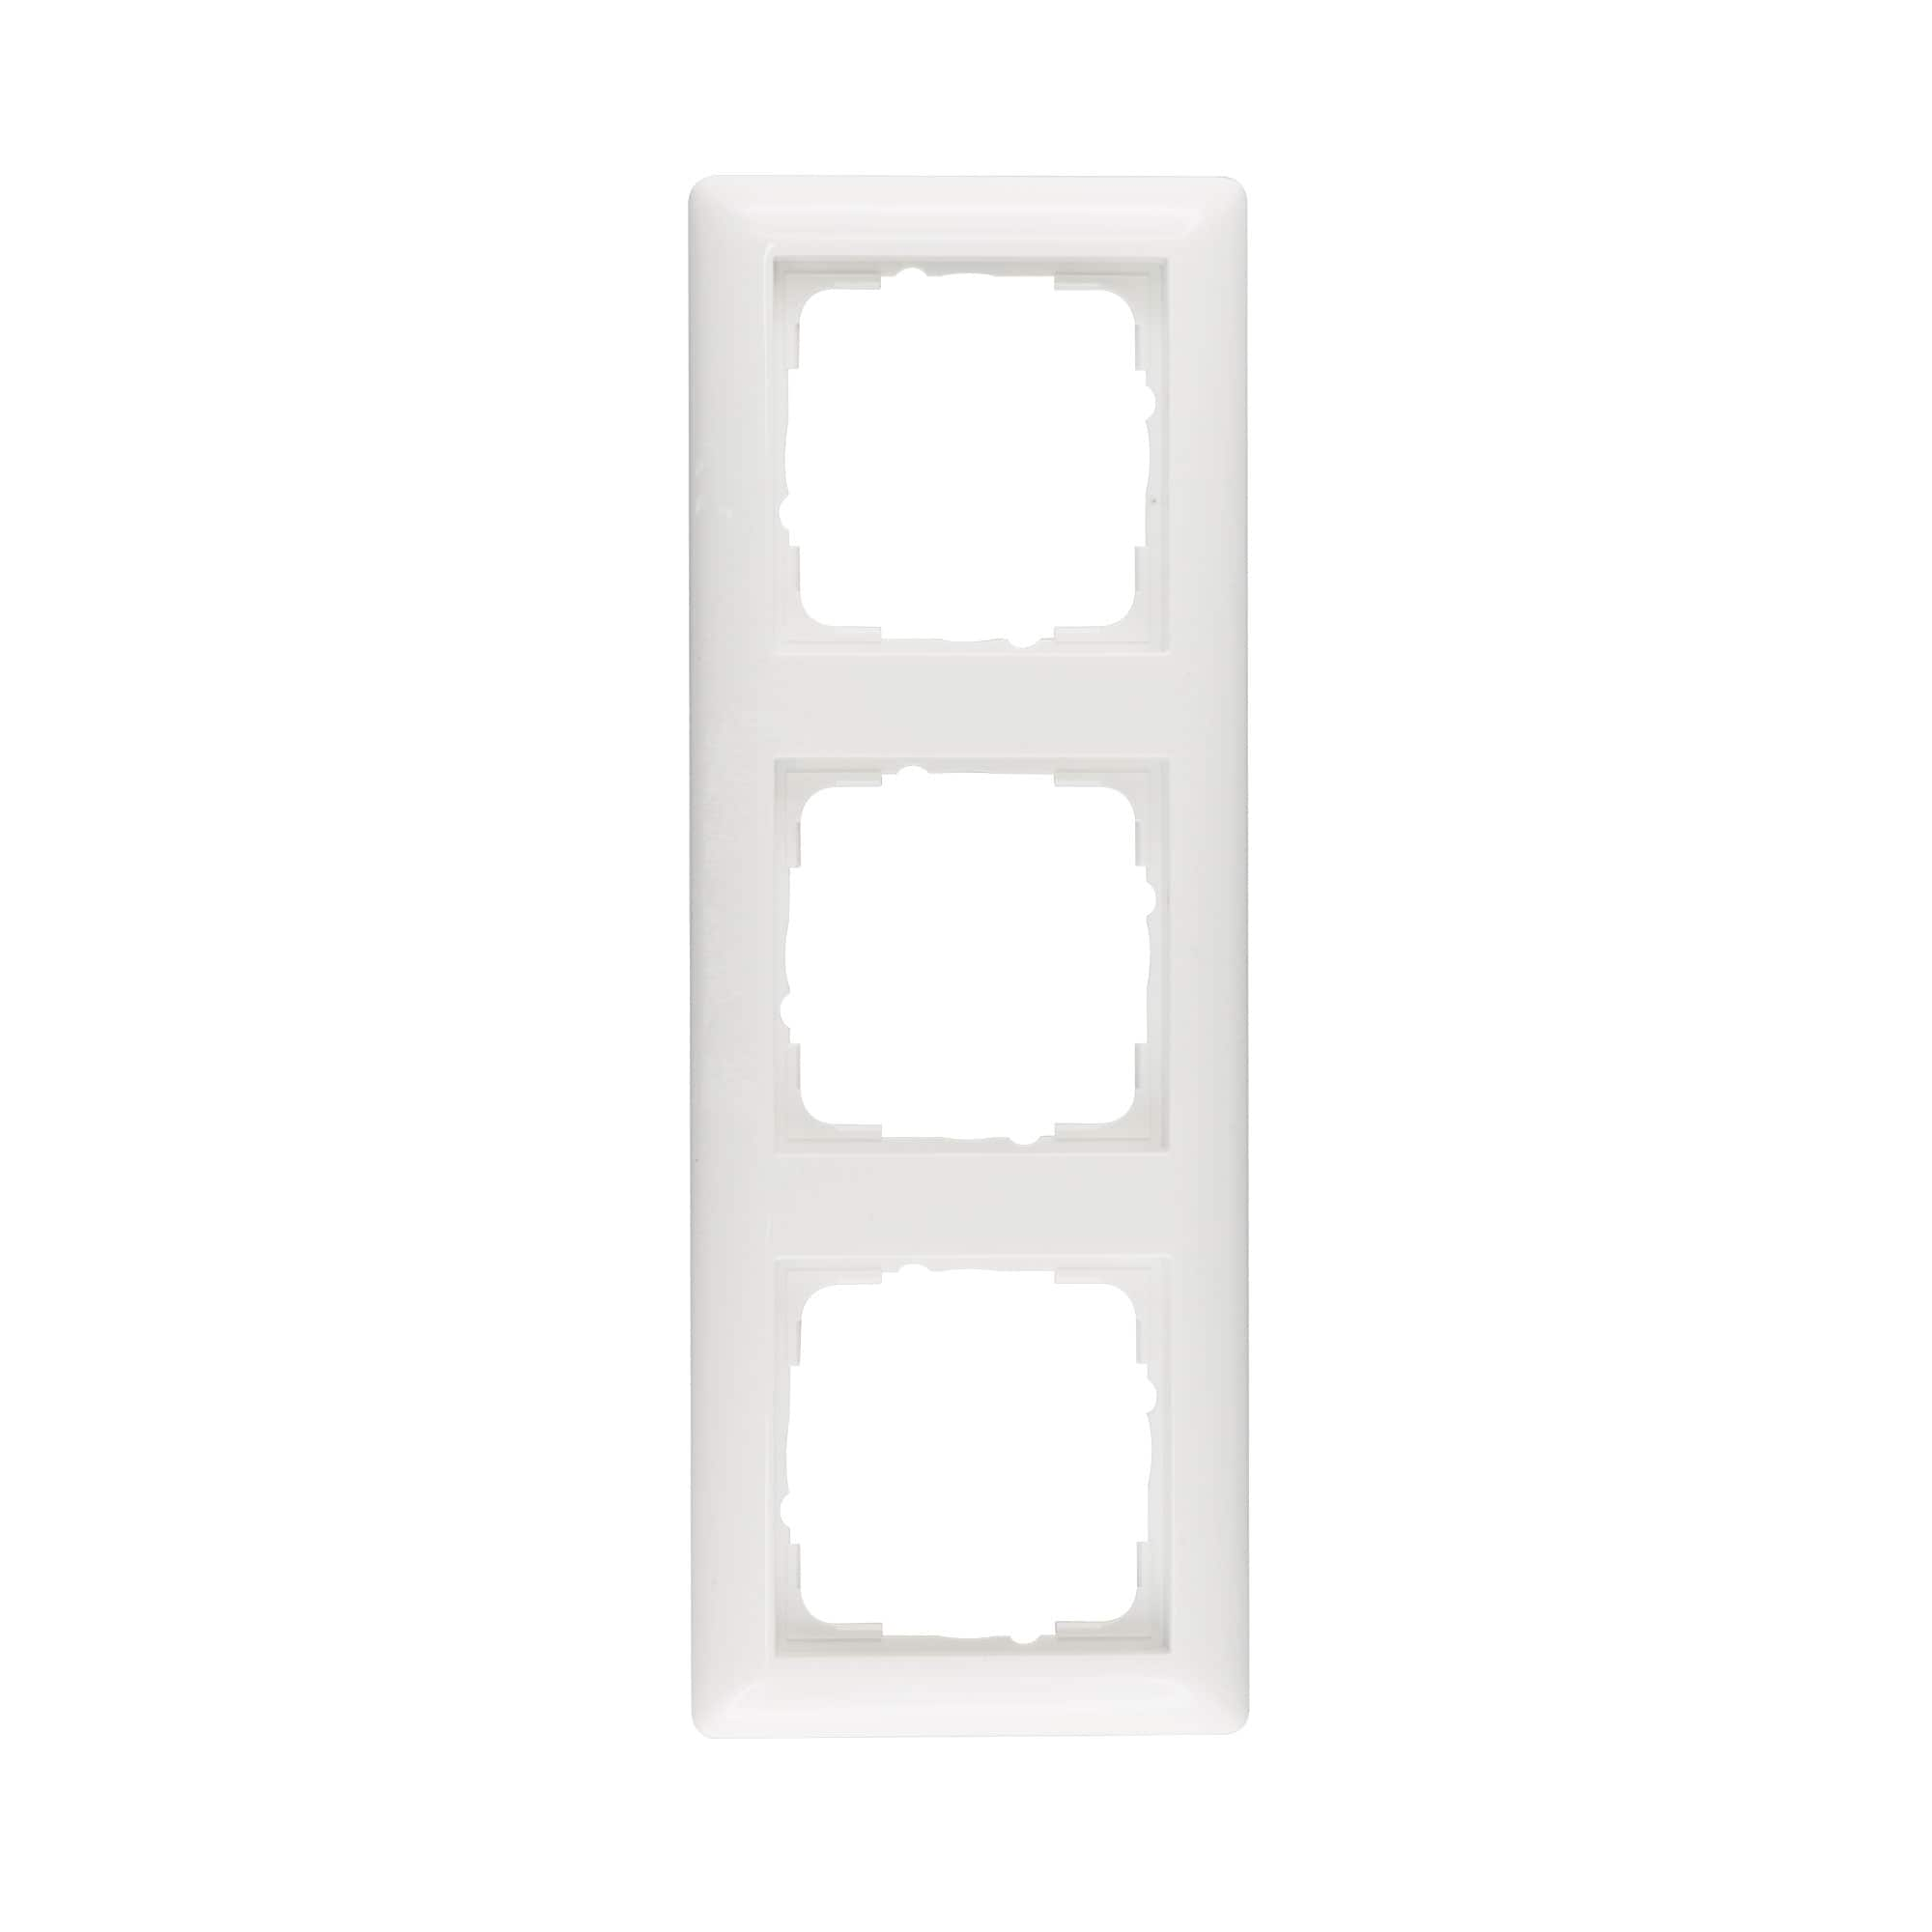 Gira Standard 55 - 3-Fach Rahmen (21303) - Abdeckrahmen ...